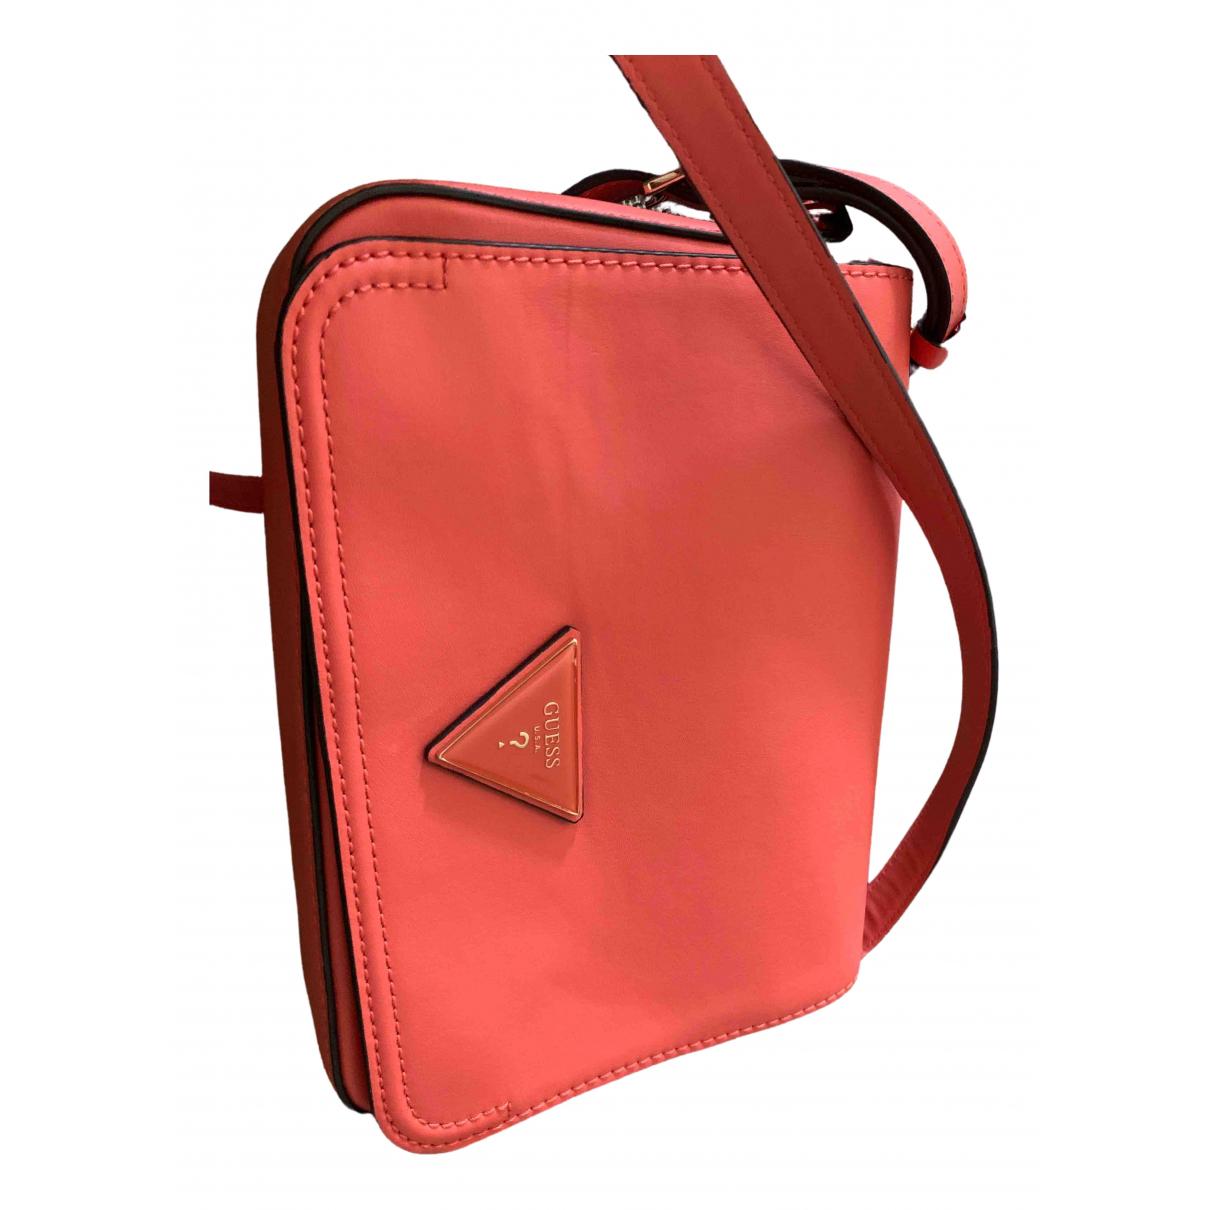 Guess \N Orange Leather handbag for Women \N